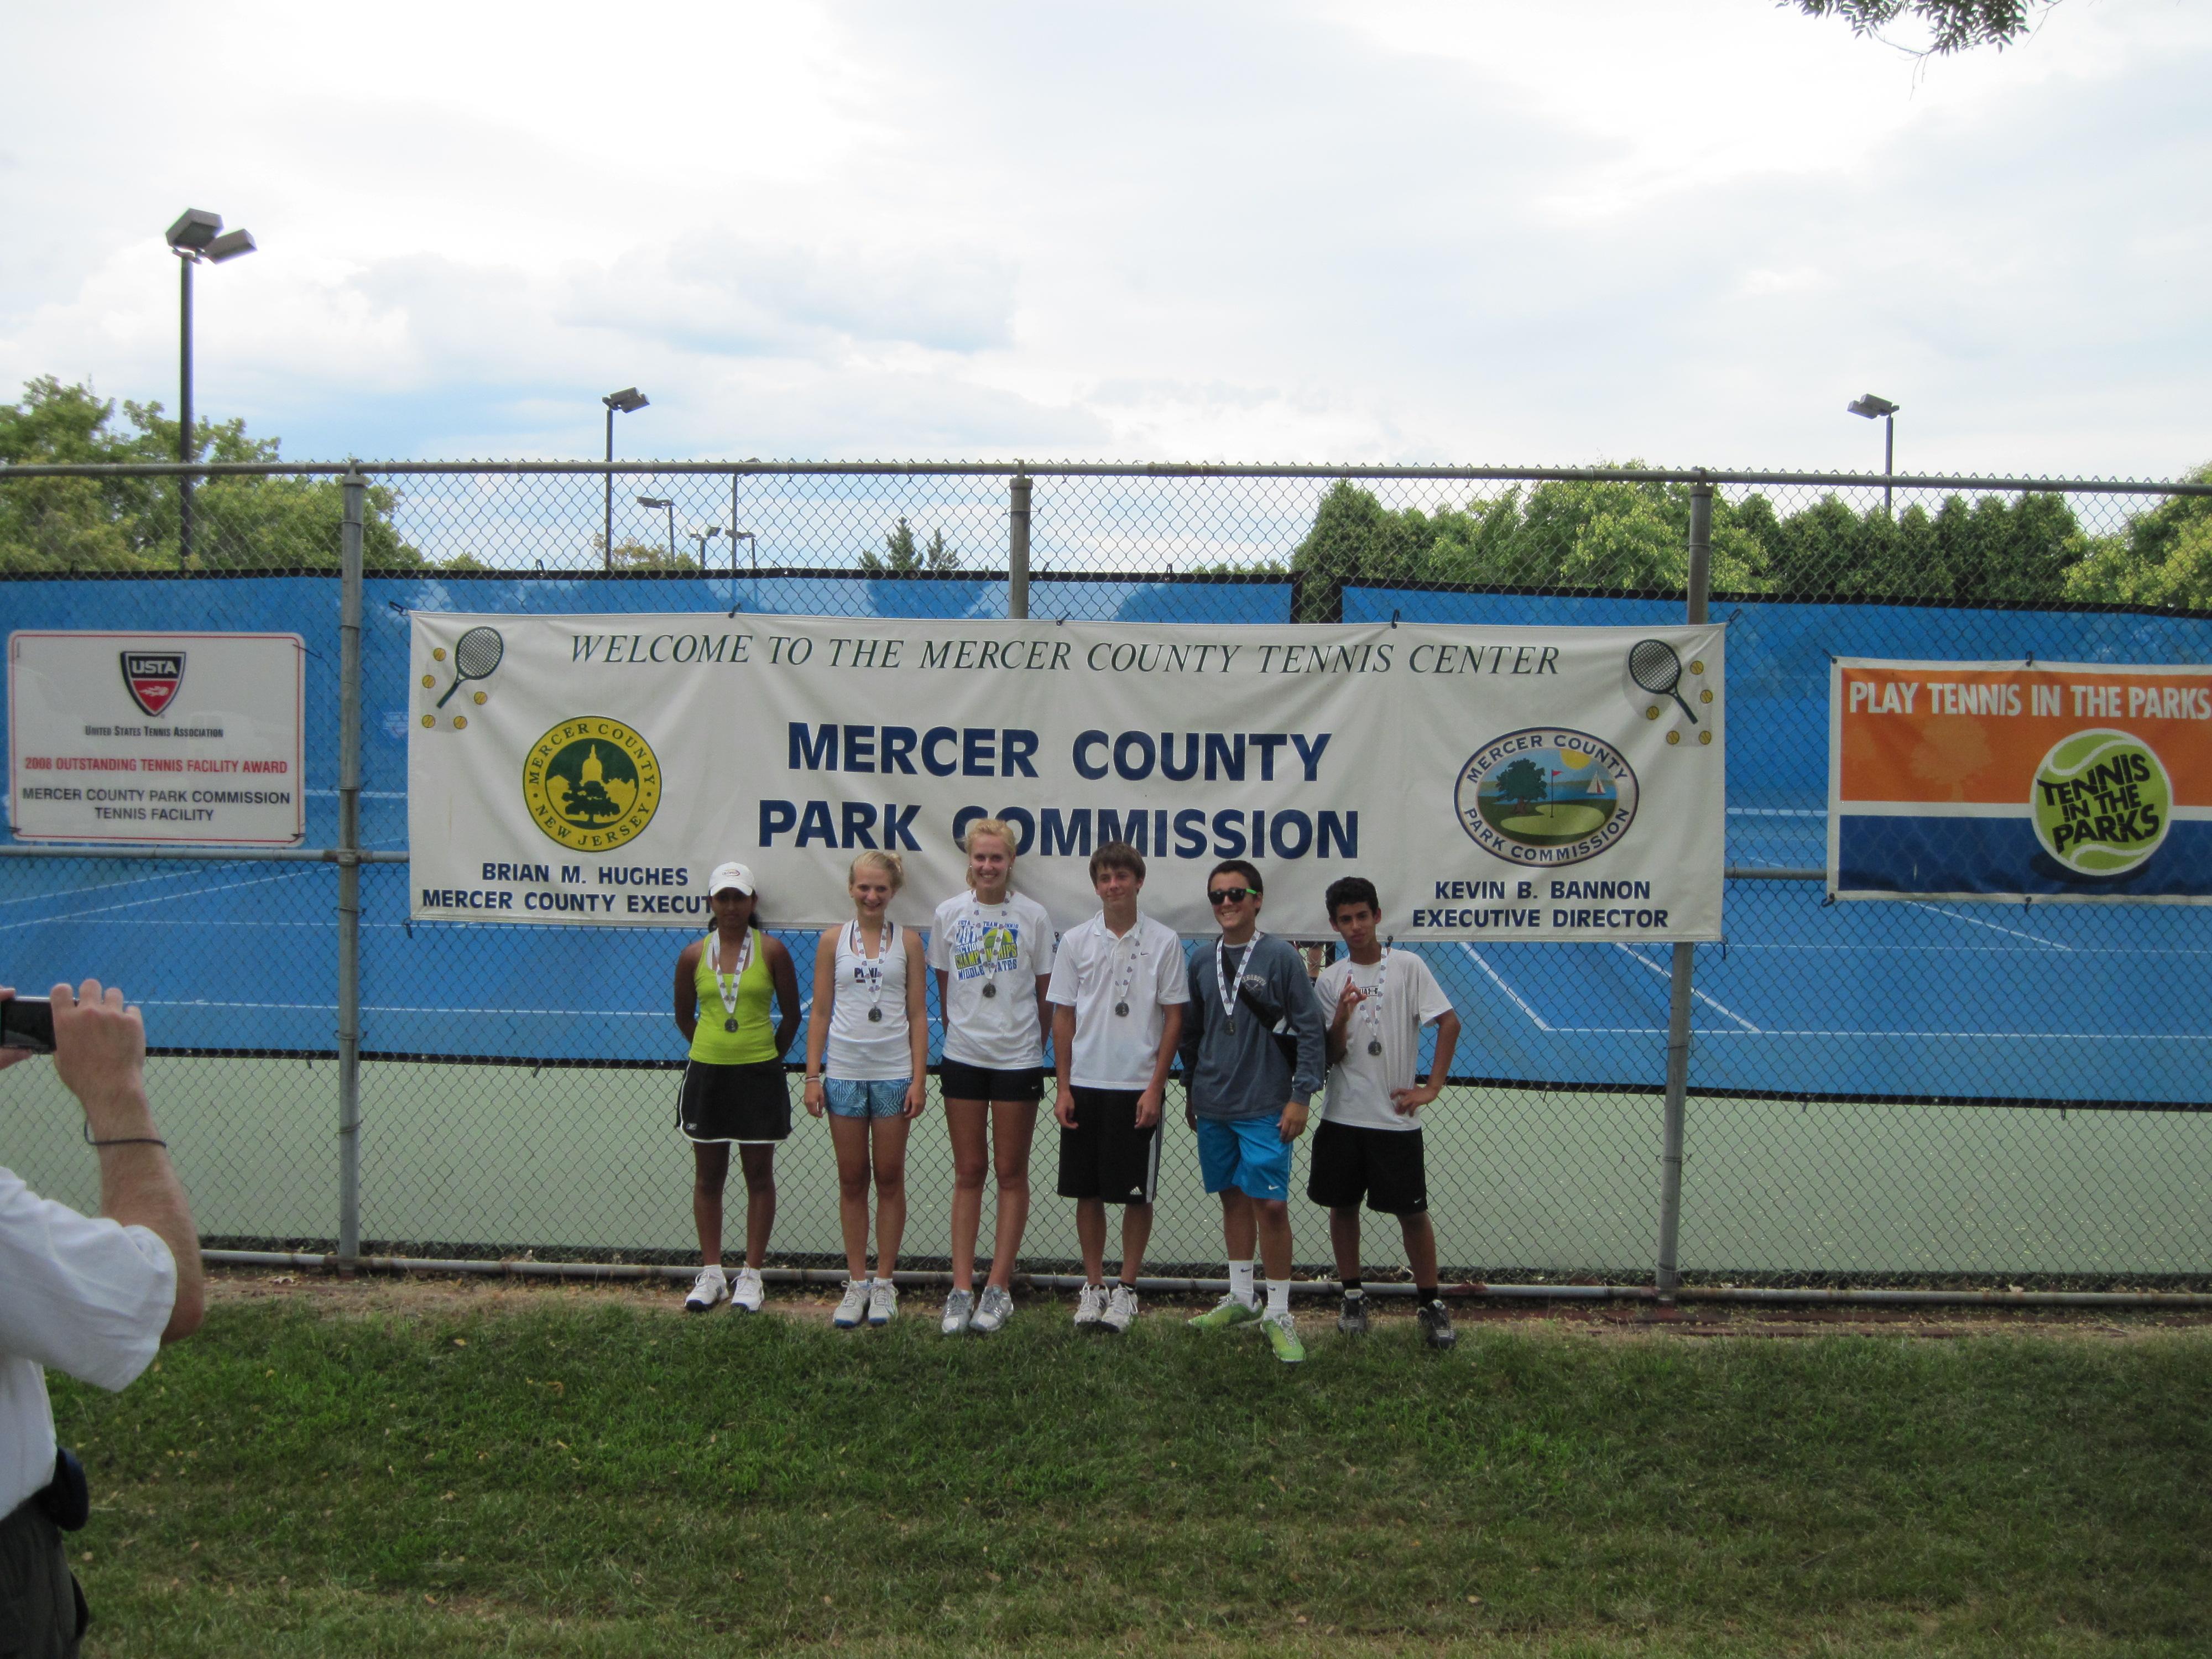 Set Point Tennis Team Runner-Up 18 Division Mercer Park New Jersey